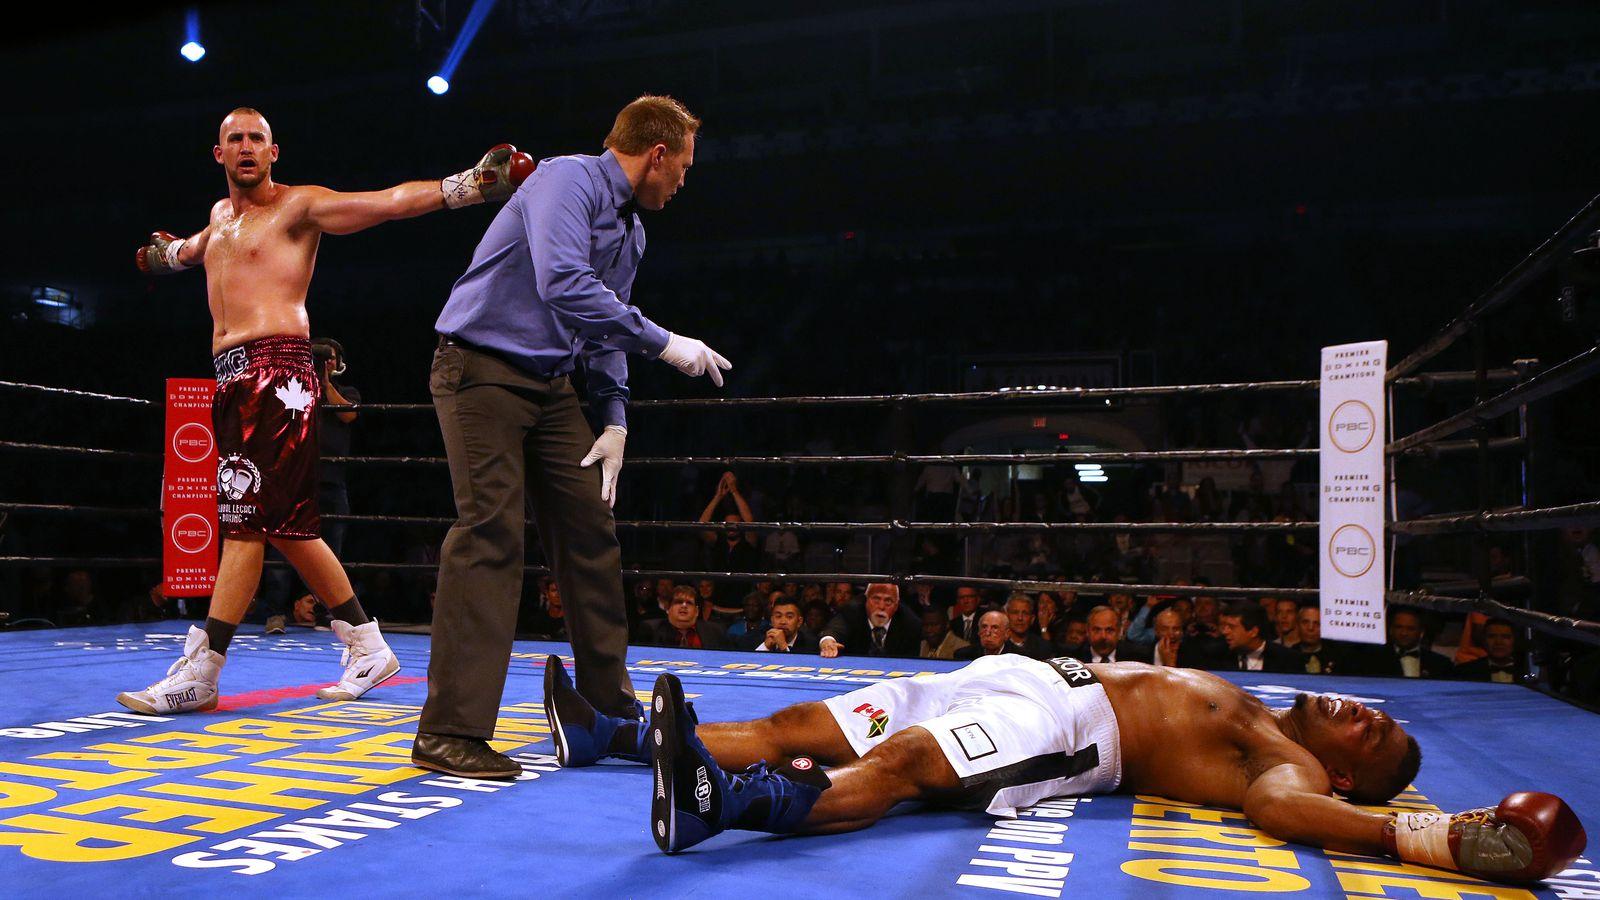 Bo boxer wladimir klitschko wikipedia the - Video 51 Year Old Razor Ruddock Suffers Brutal Ko Loss In Comeback Fight Bloody Elbow